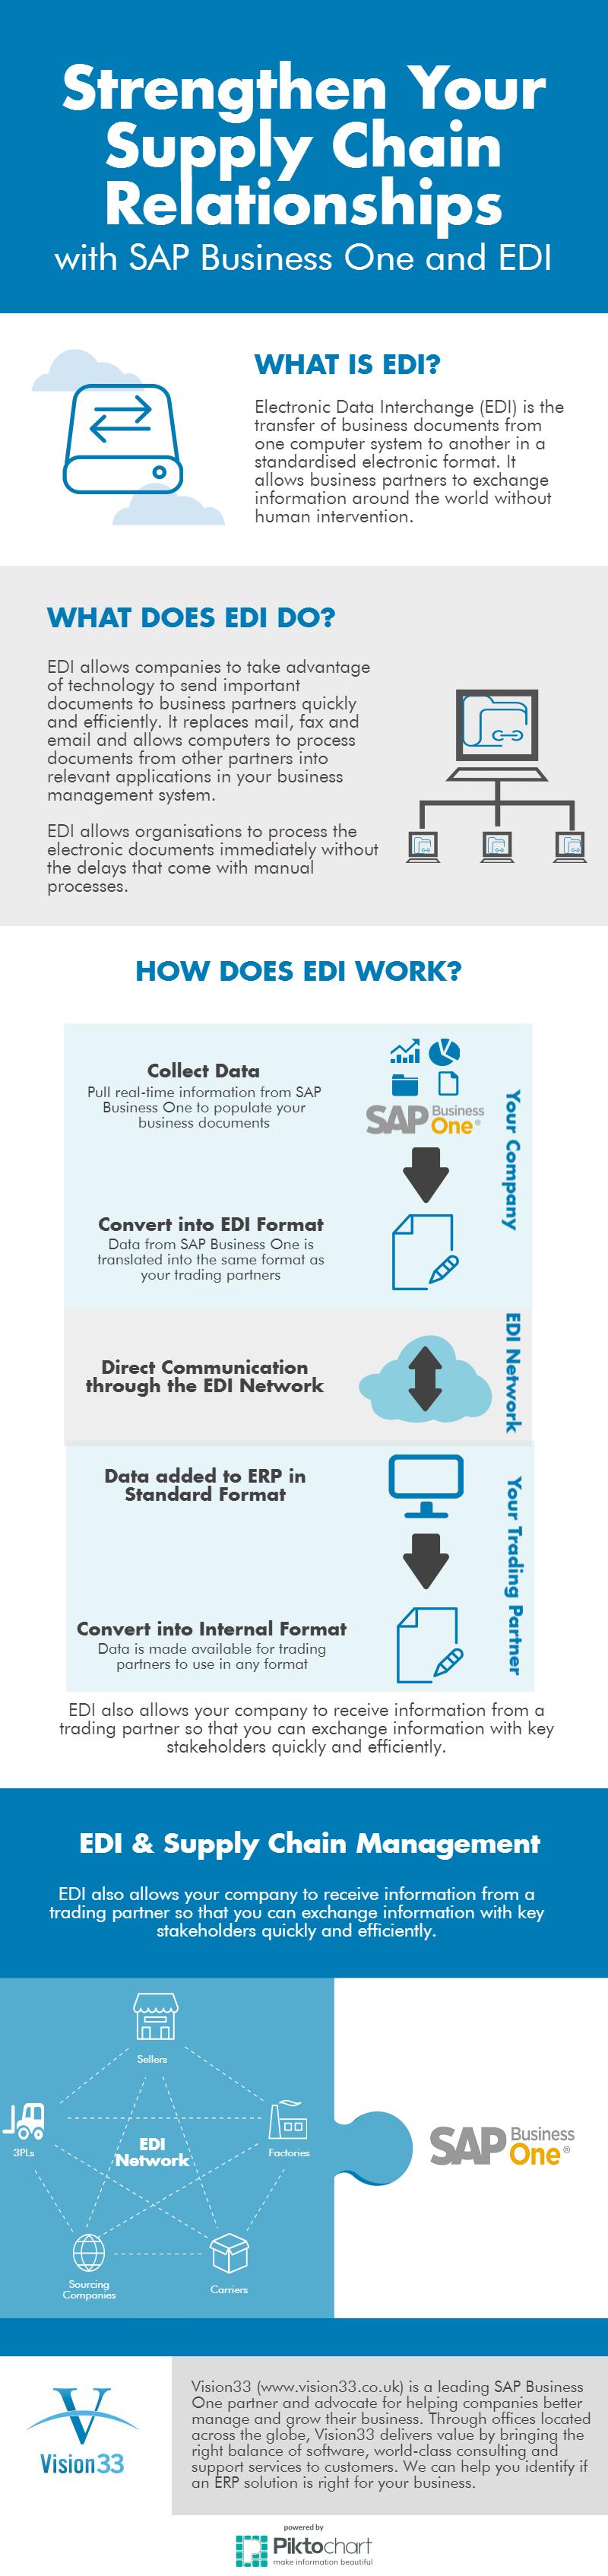 What is Electronic Data Interchange (EDI)?